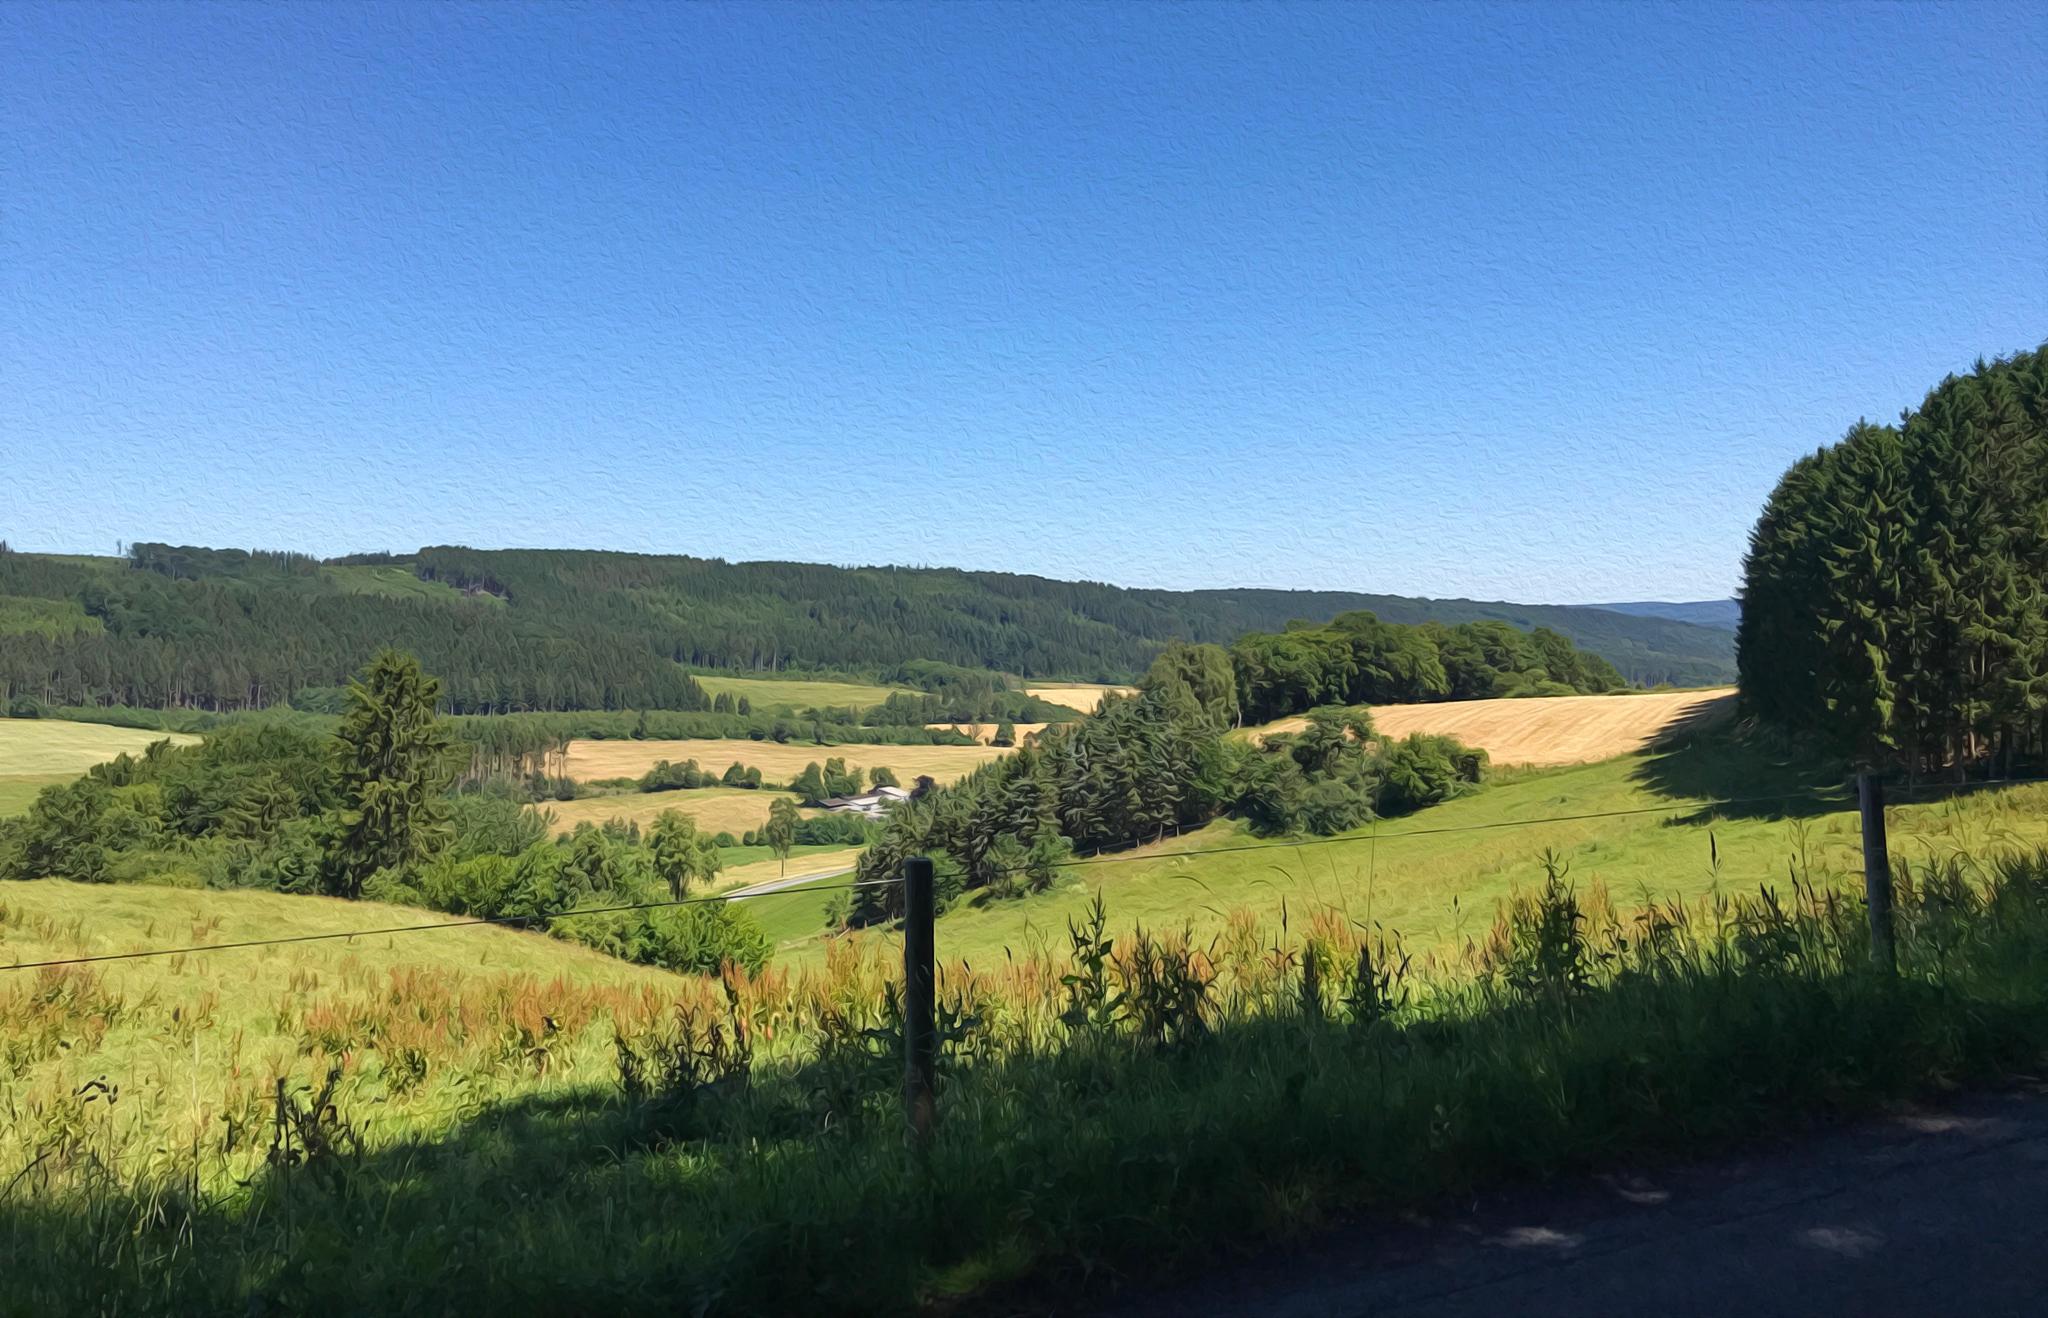 Through Germany: Wengeler Höhe